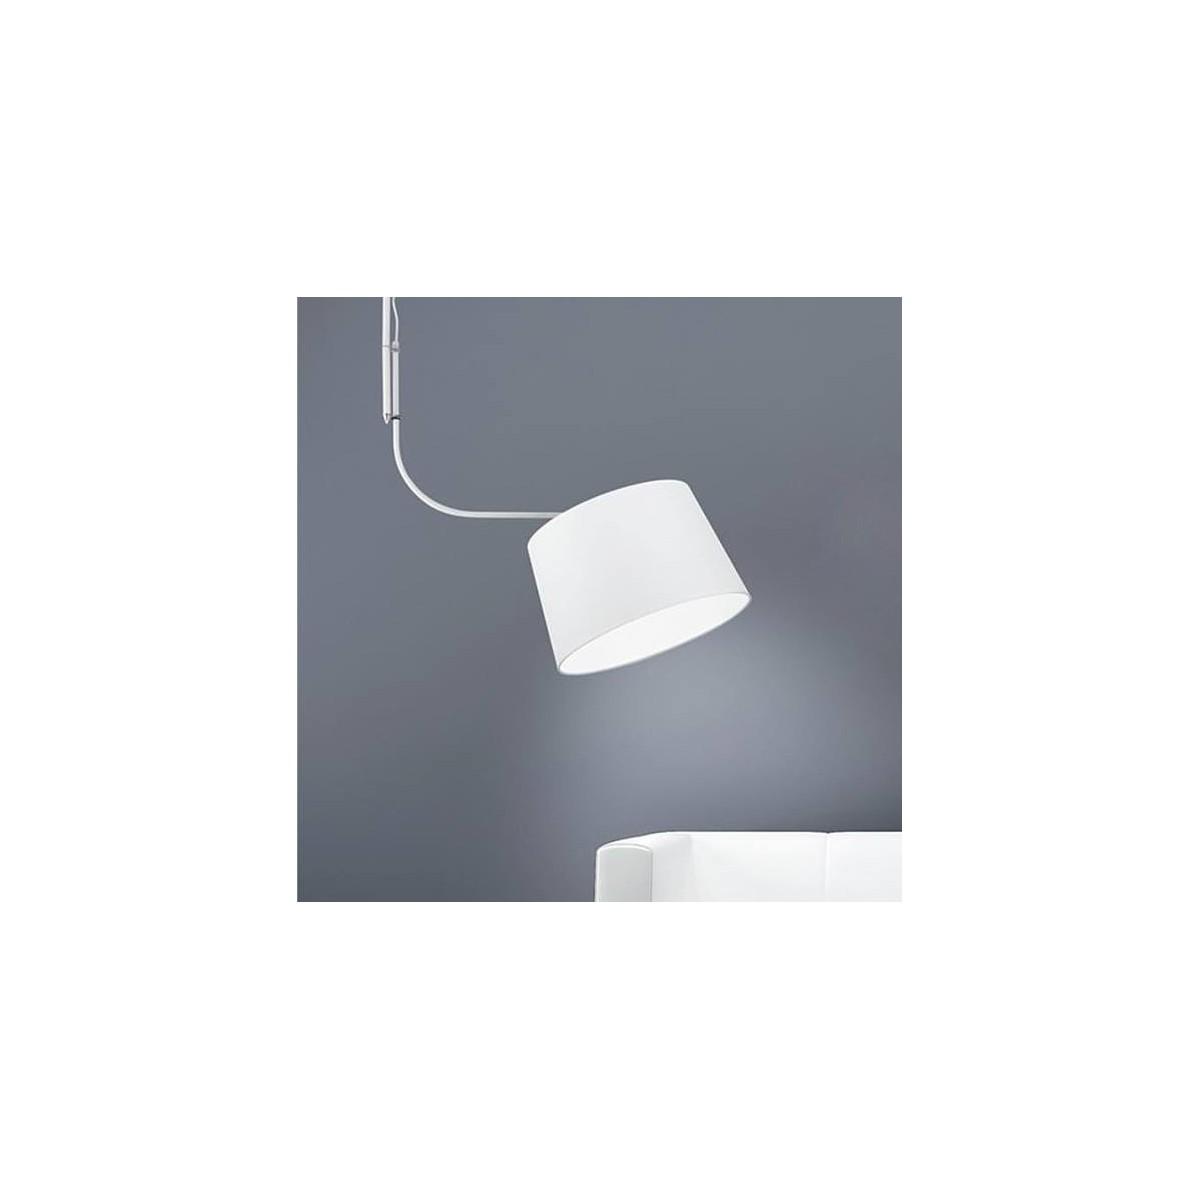 I-BRIDGE/S - Sospensione Metallo Bianco Paralume Tessuto Bianco Lampadario Moderno E27